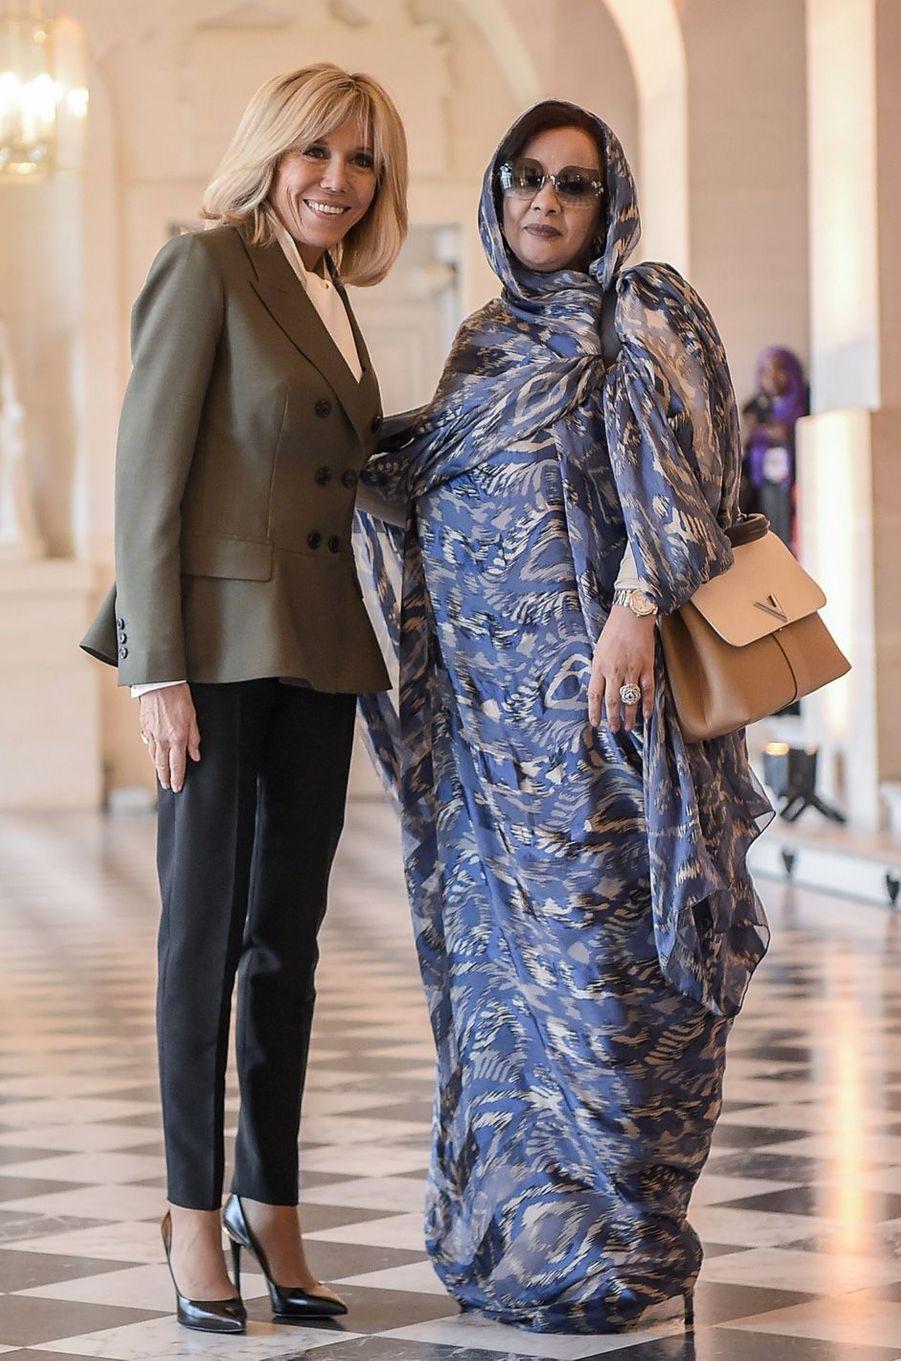 AvecTekber Mint Melainine Ould Ahmed, épouse duprésident mauritanienMohamed Ould Abdel Aziz.